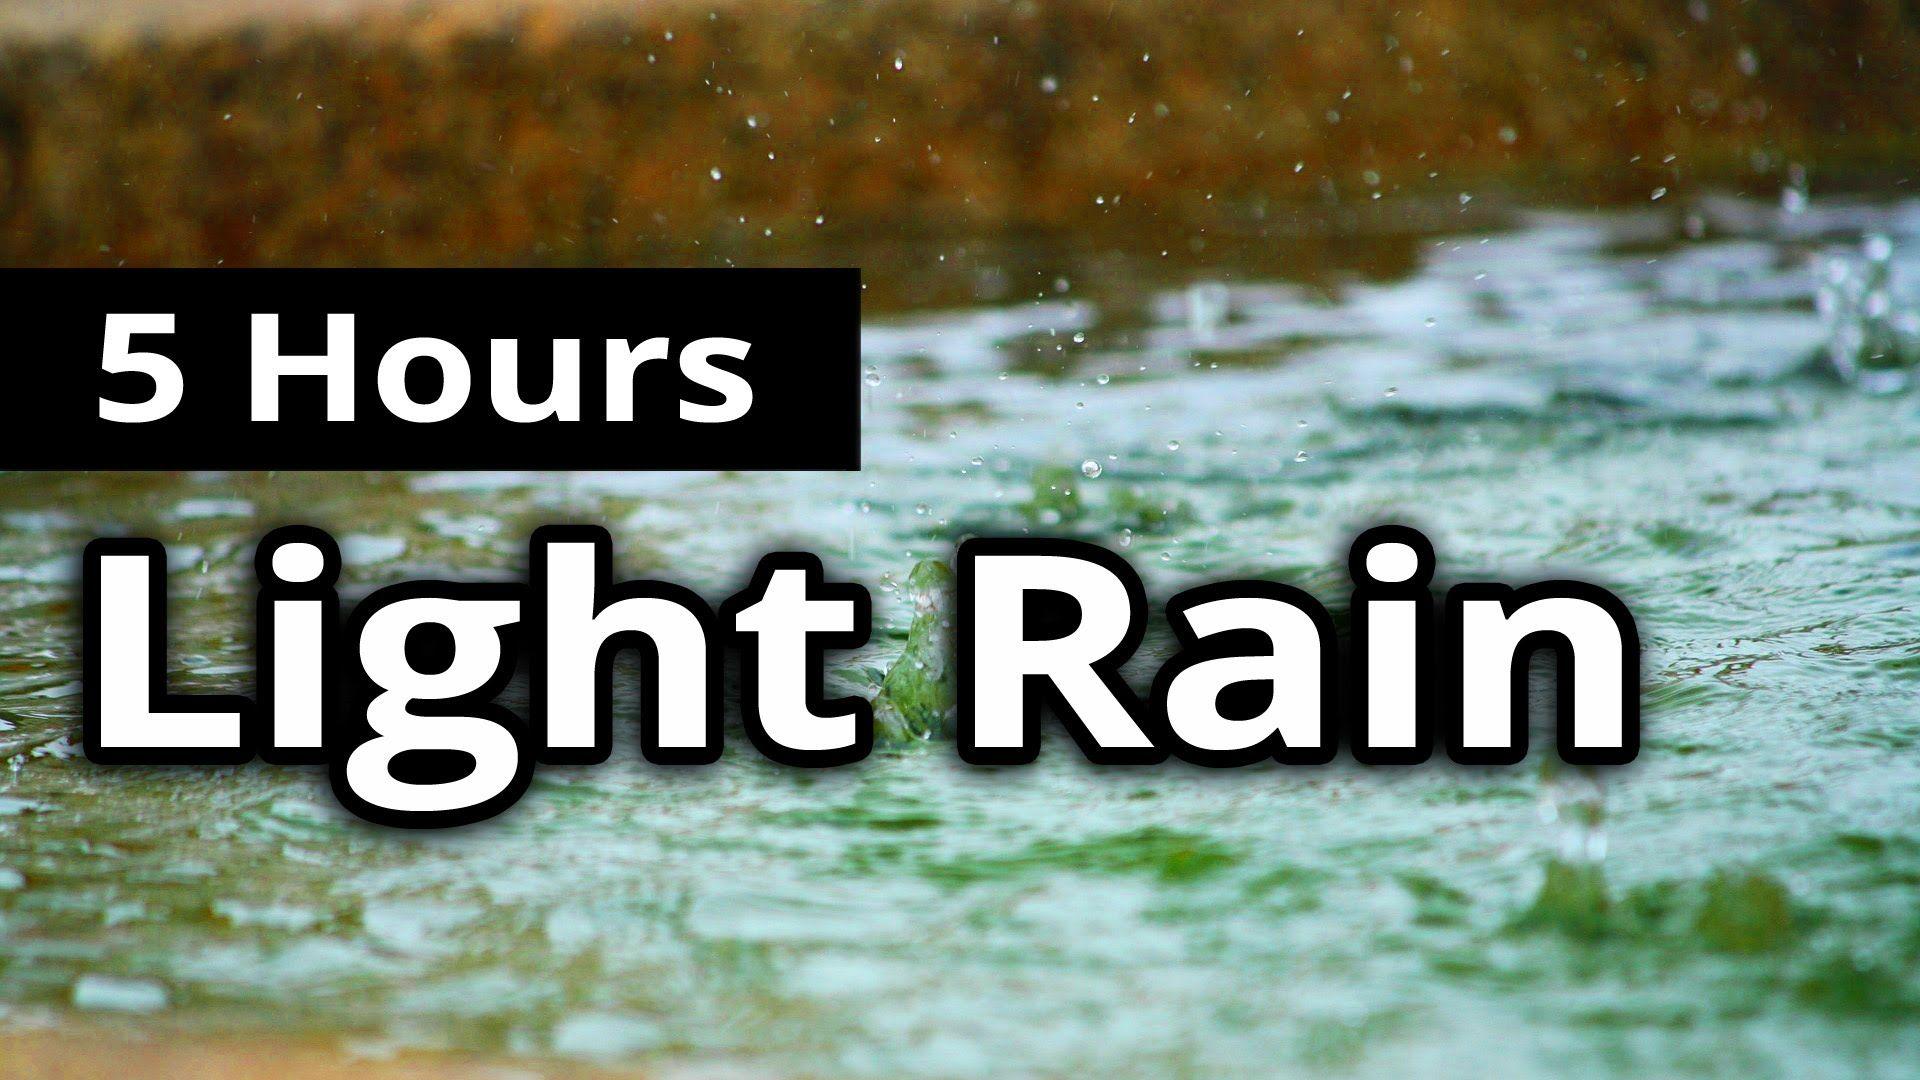 ASMR Rain  Delicate Light RAIN for  HOURS  Sleep Sounds